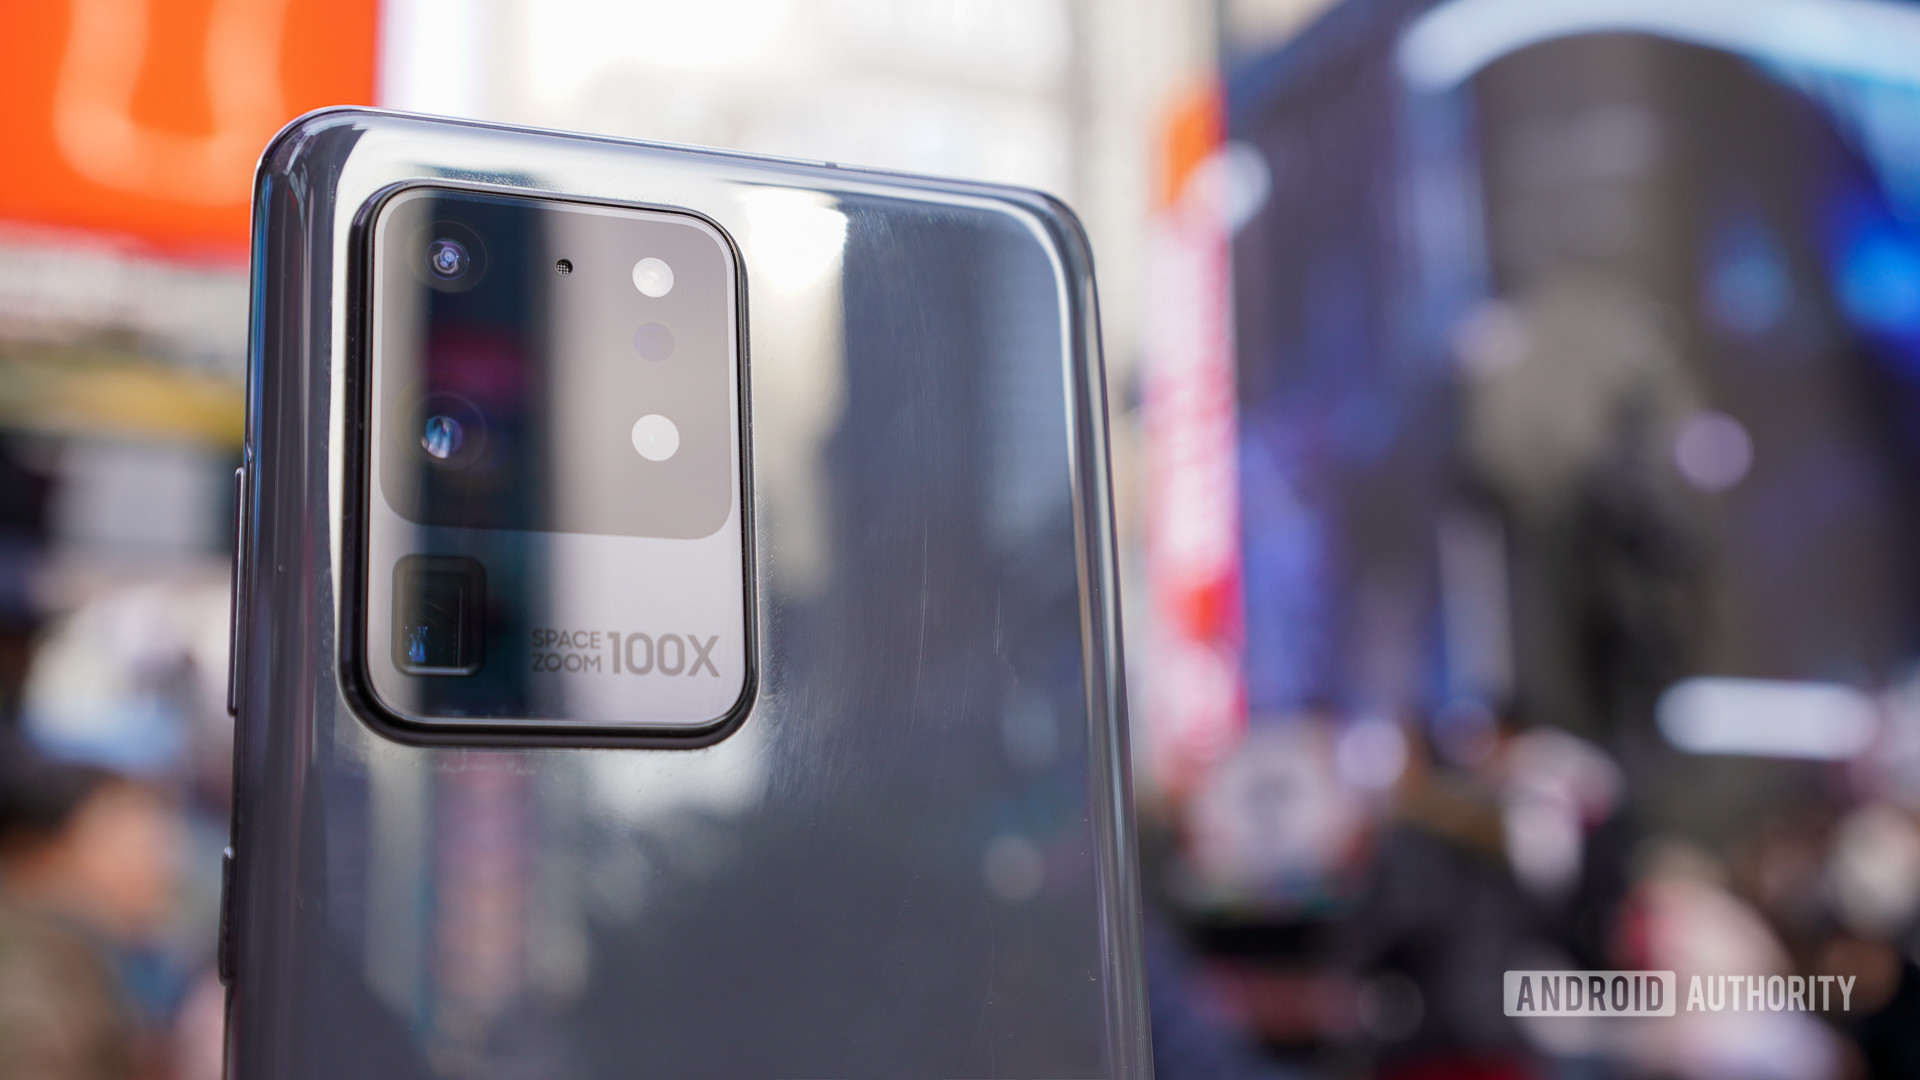 Samsung Galaxy S20 Ultra money shot